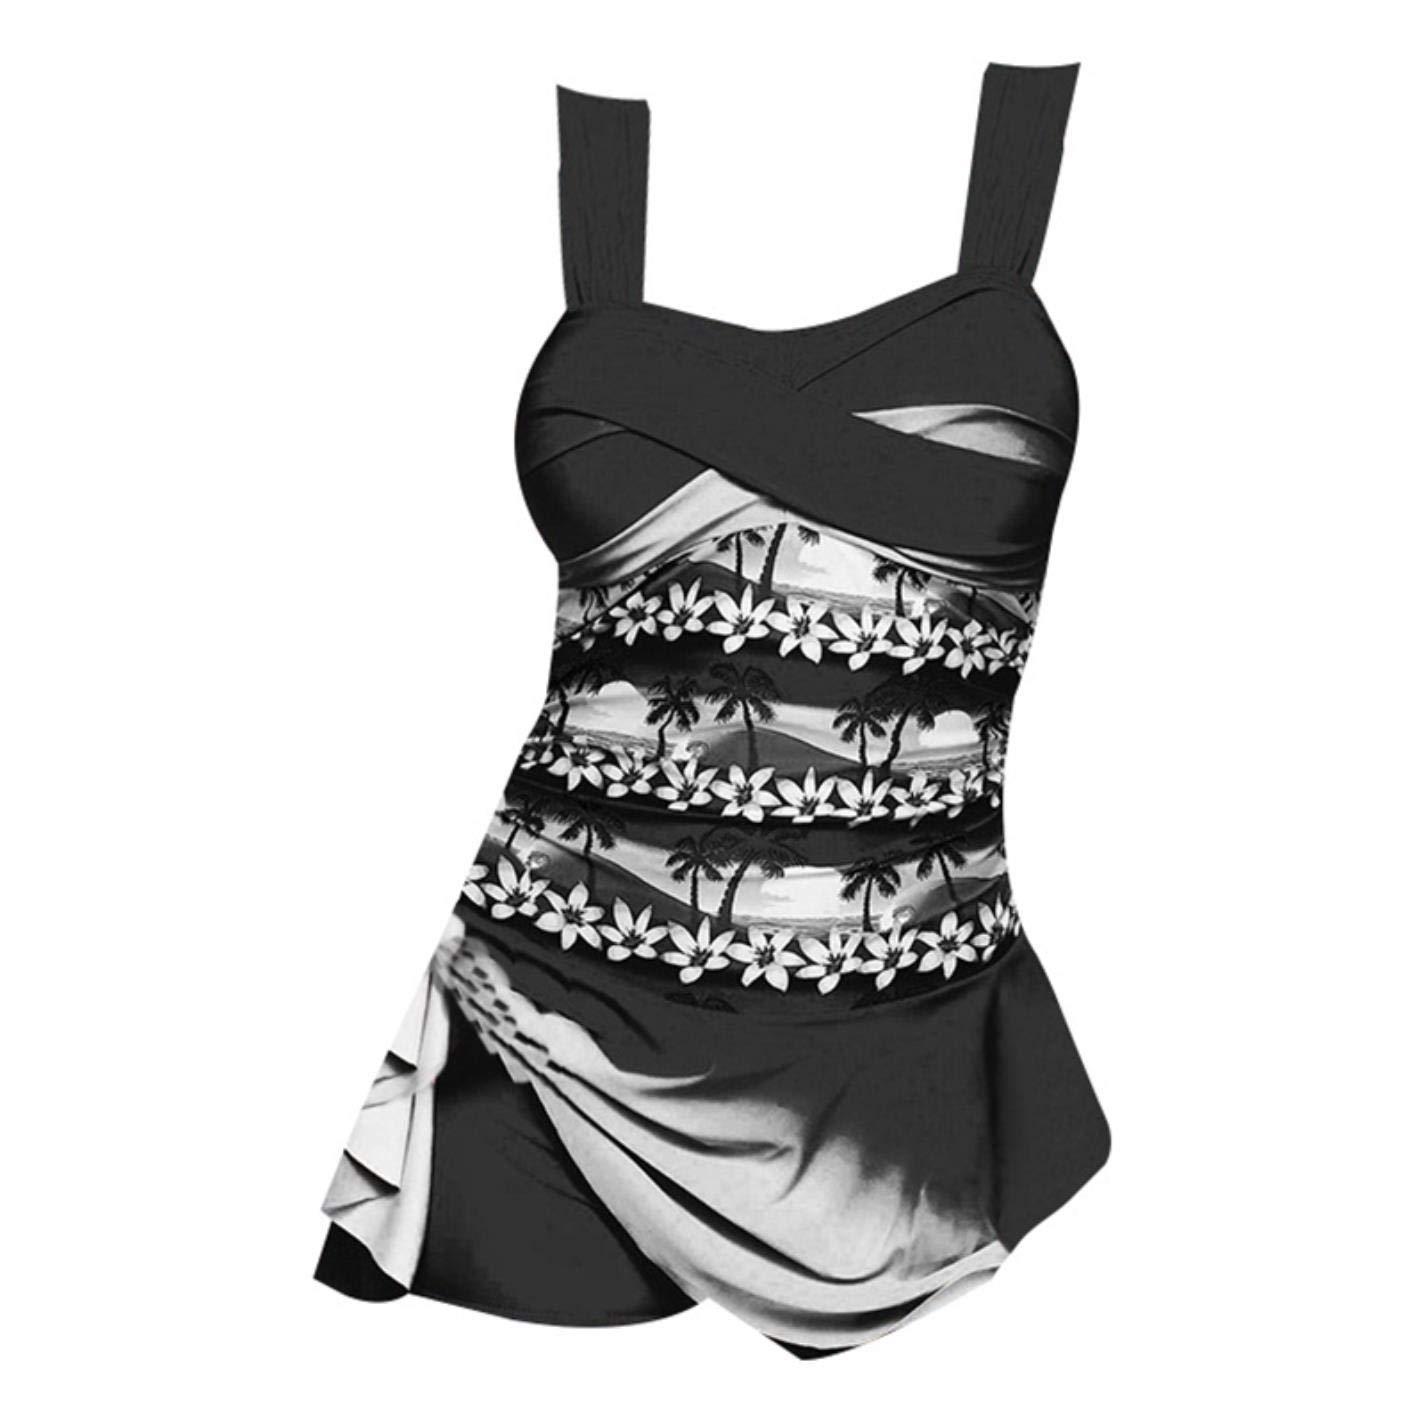 HSH/_H Retro Print Push Up One Piece Monokini Ruched Tummy Control Swimsuit Skirt Swimwear Women Plus Size Bathingsuit Shorts Dres Purple